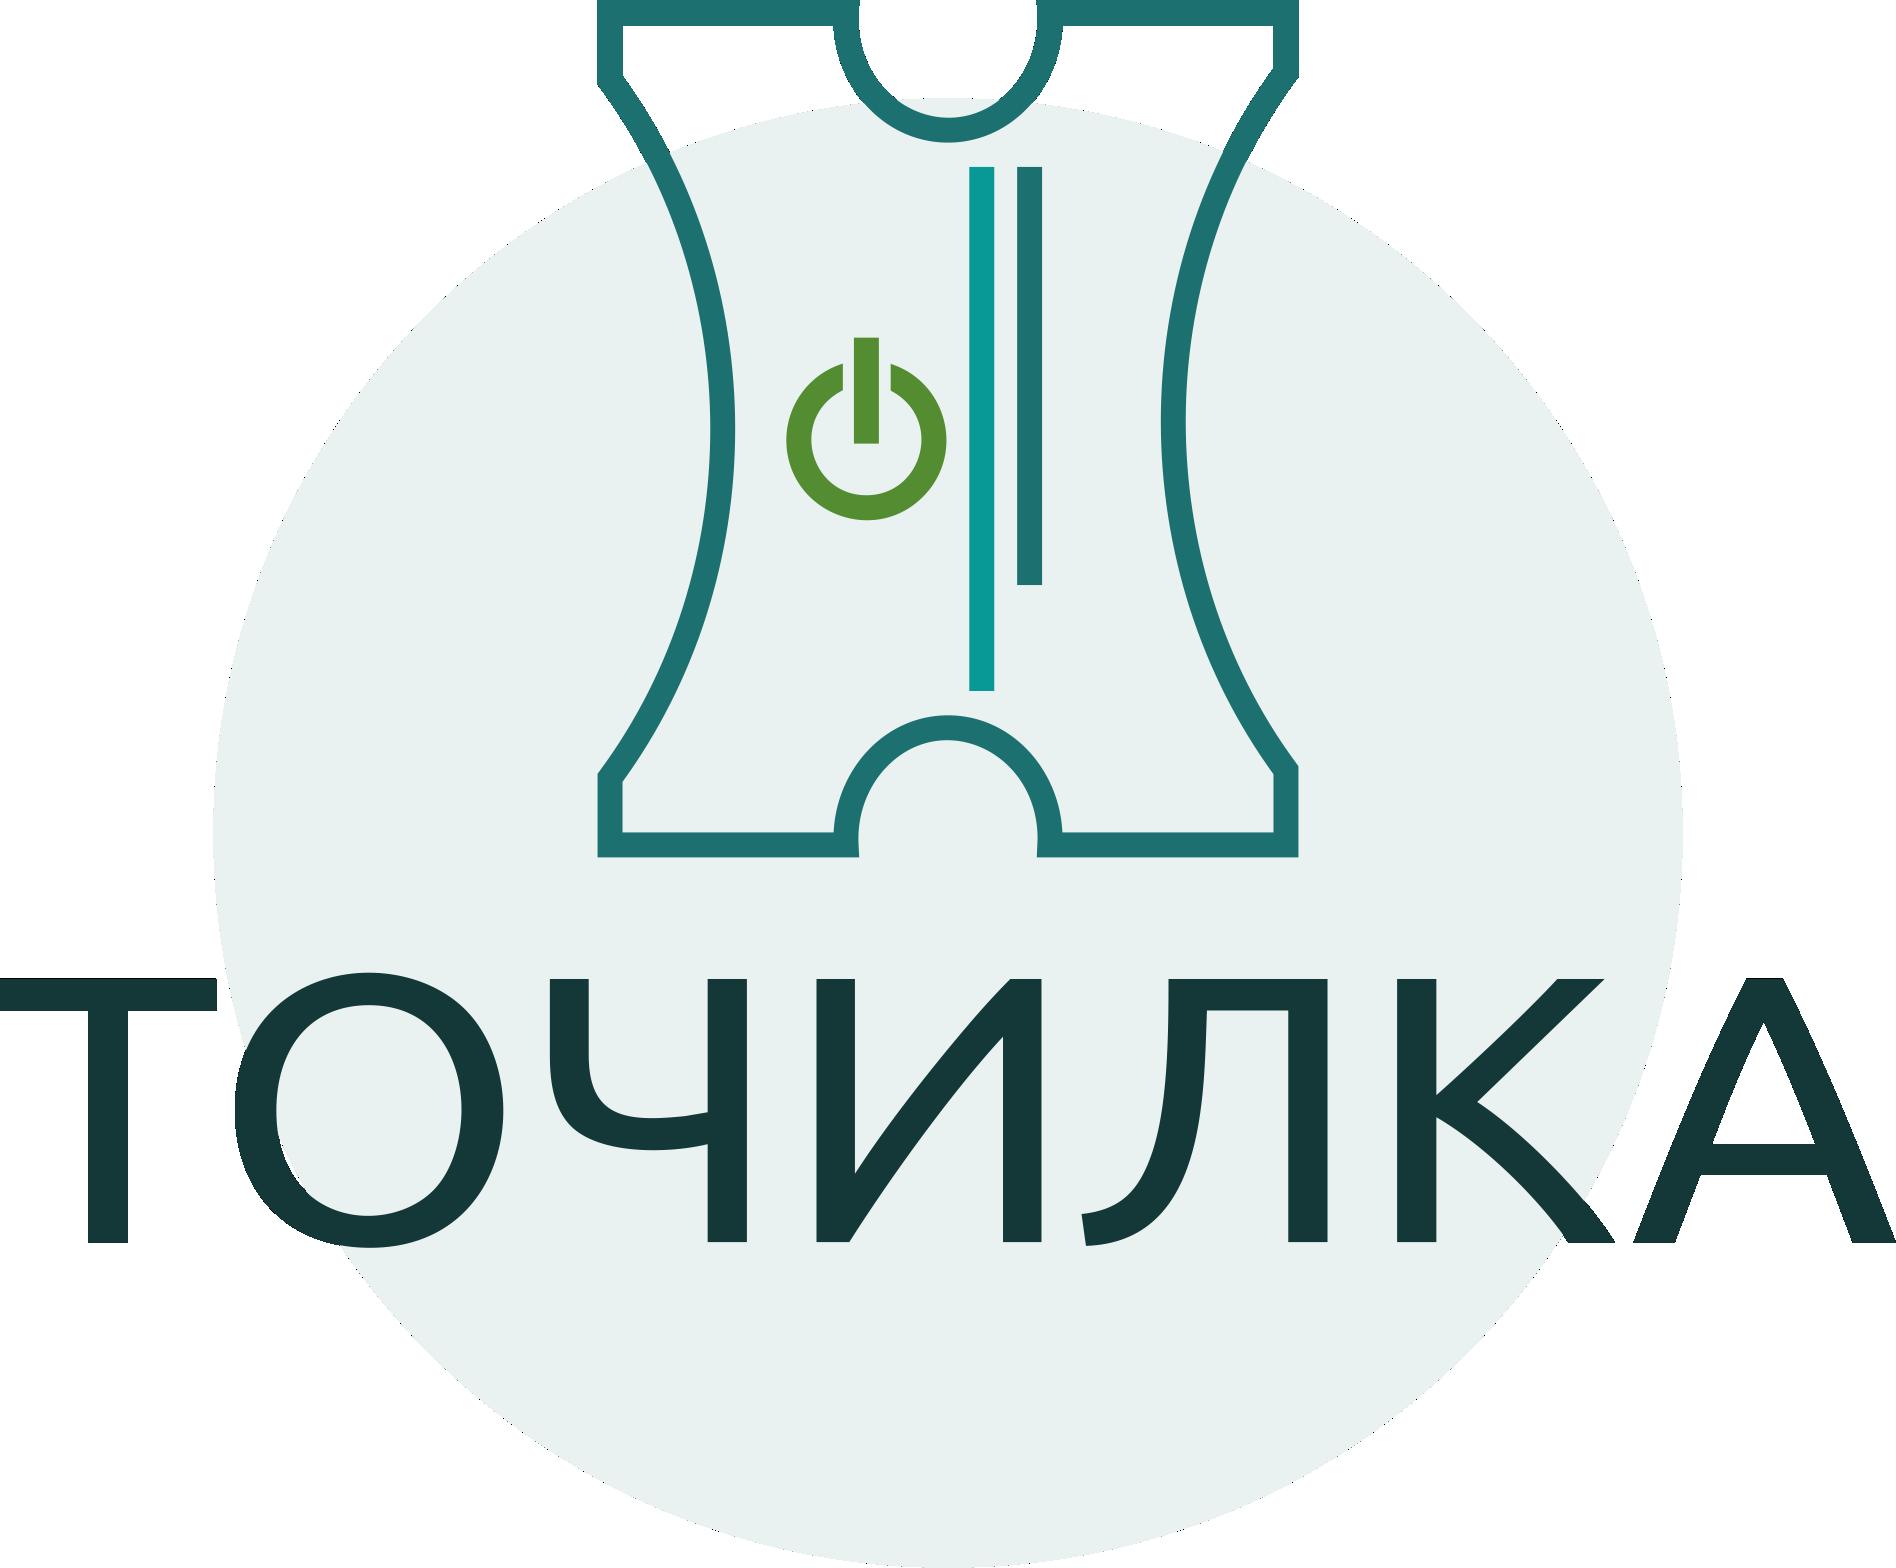 Tochilka.by